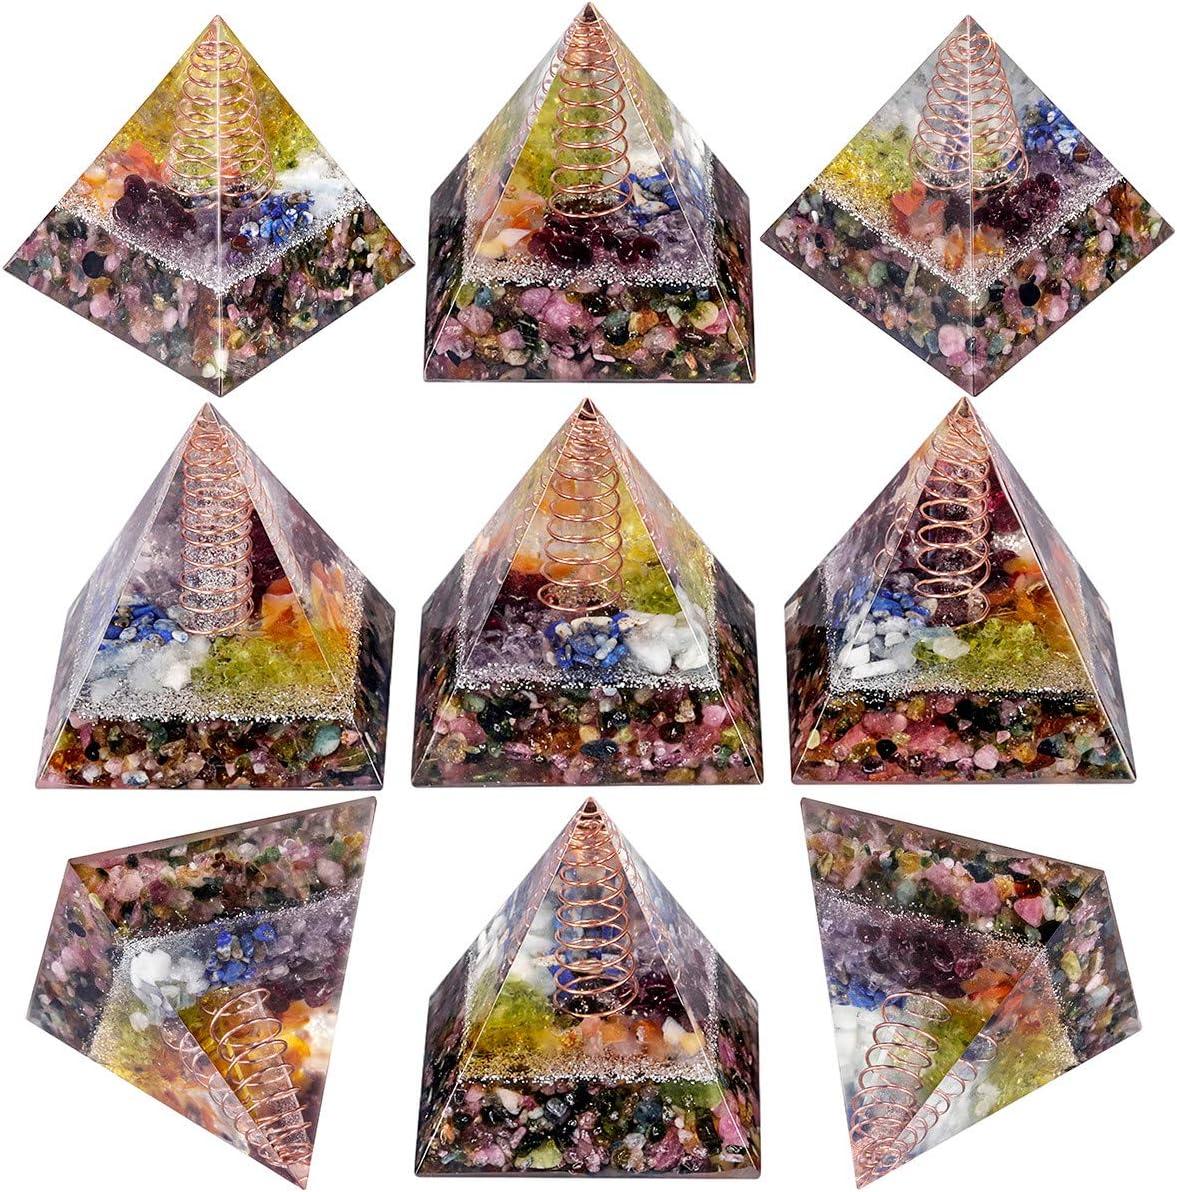 Nupuyai Lapis Lazuli Healing Crystal Pyramid for Protection Chakra Energy Crystal Quartz Points Decor 5cm